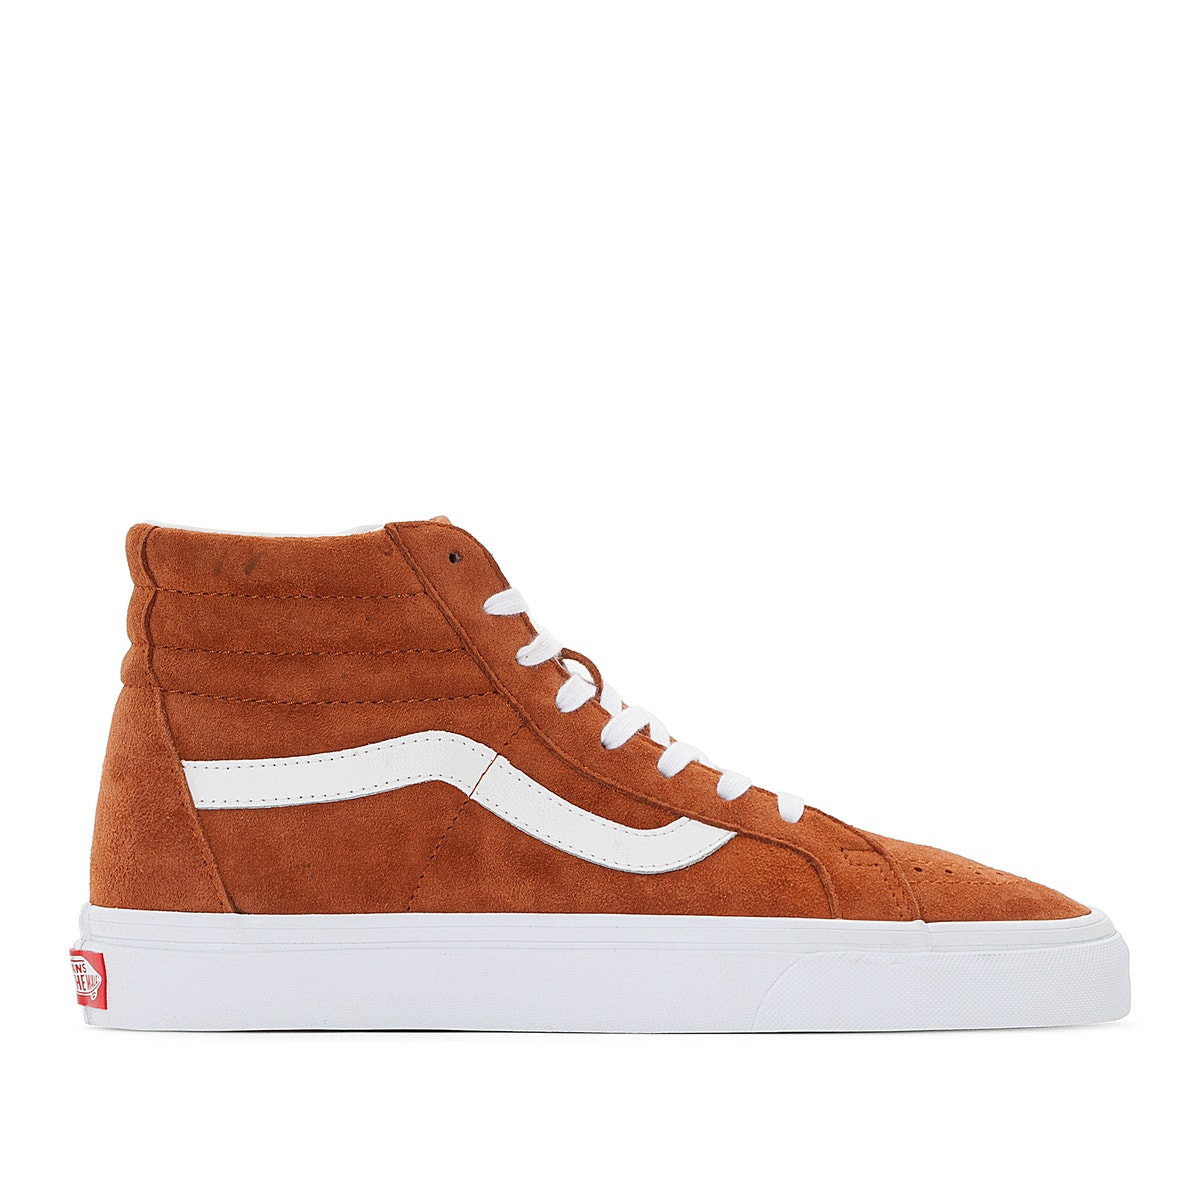 Vans - Vans UA SK8-Hi Reissue 2 350125861 - 6249 laredoute   ανδρικα   sneakers   mid cut